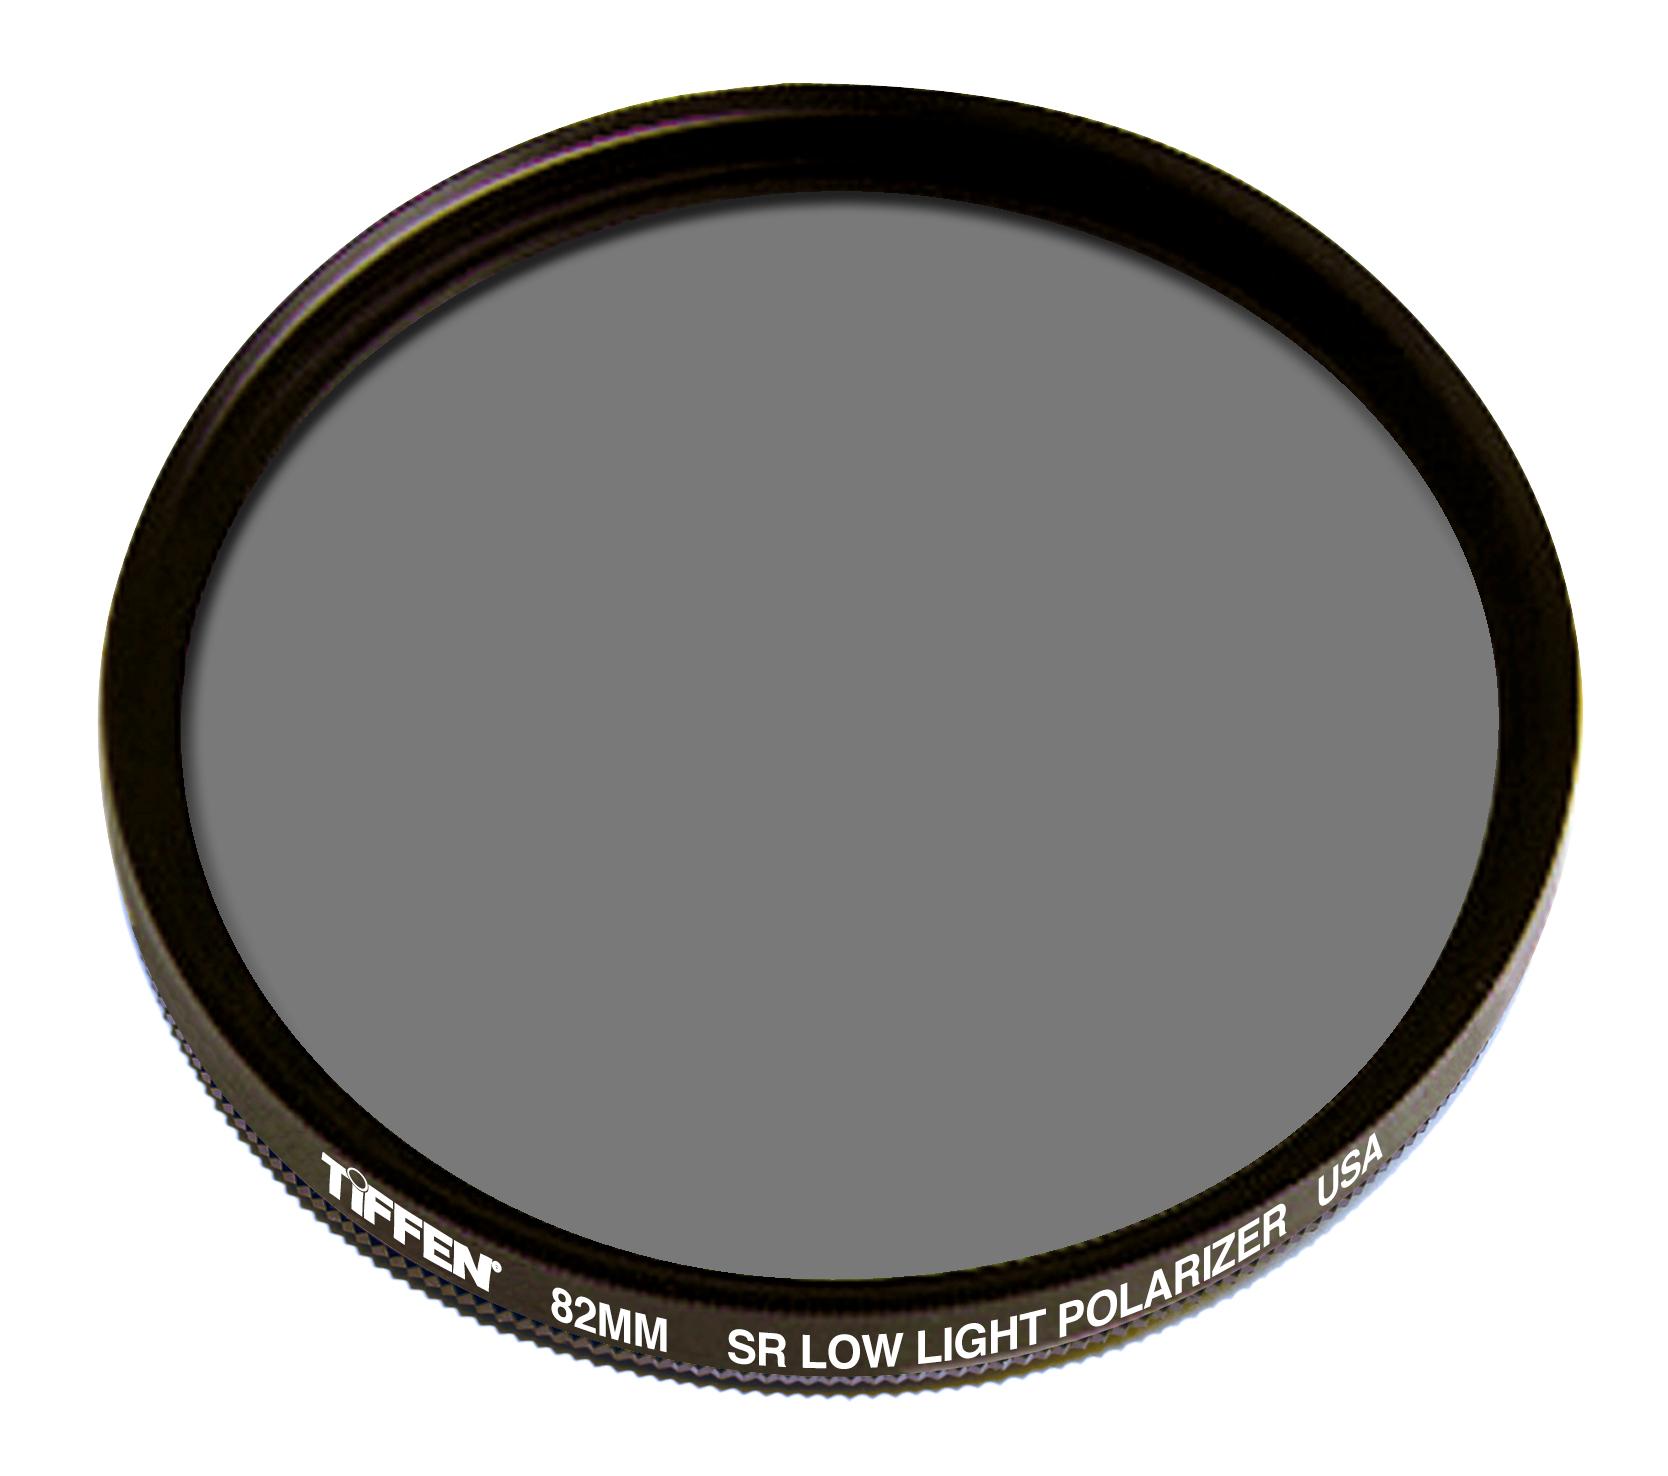 82mm Polarizer Filter, Low Light